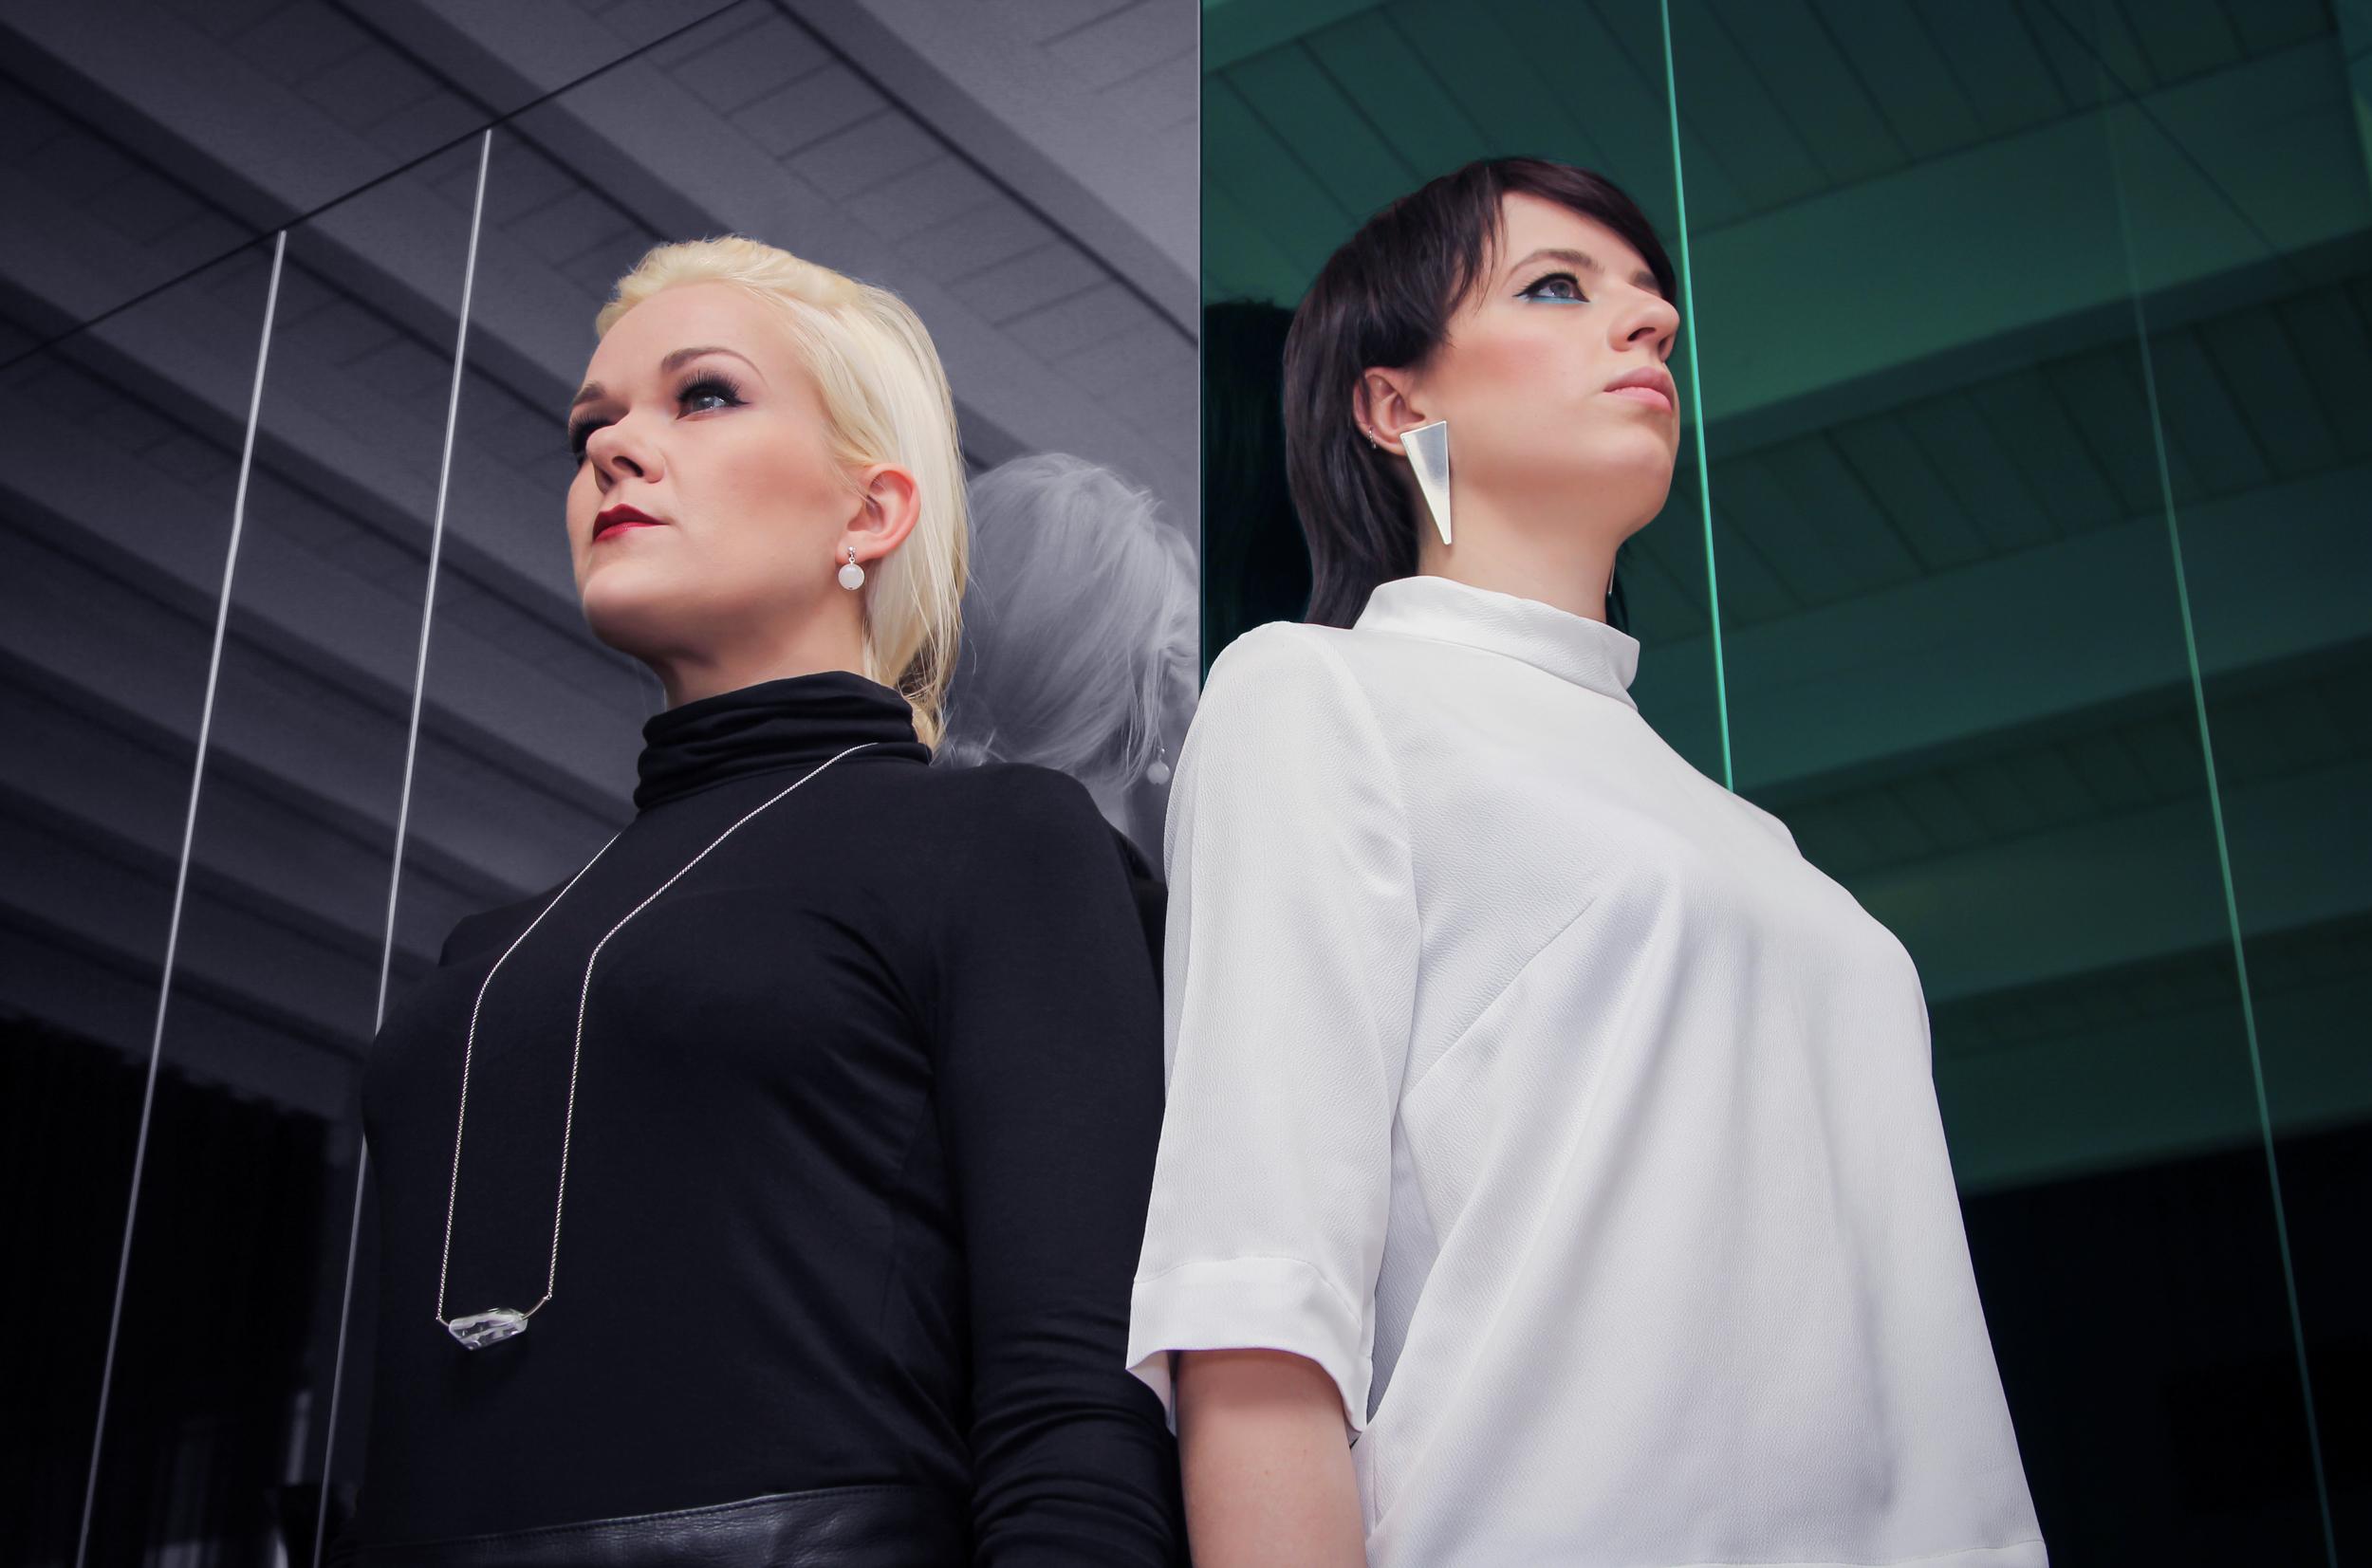 Reelika Ranik (left) and Katrin Kvade (right). Jewellery: New Vintage By Kriss